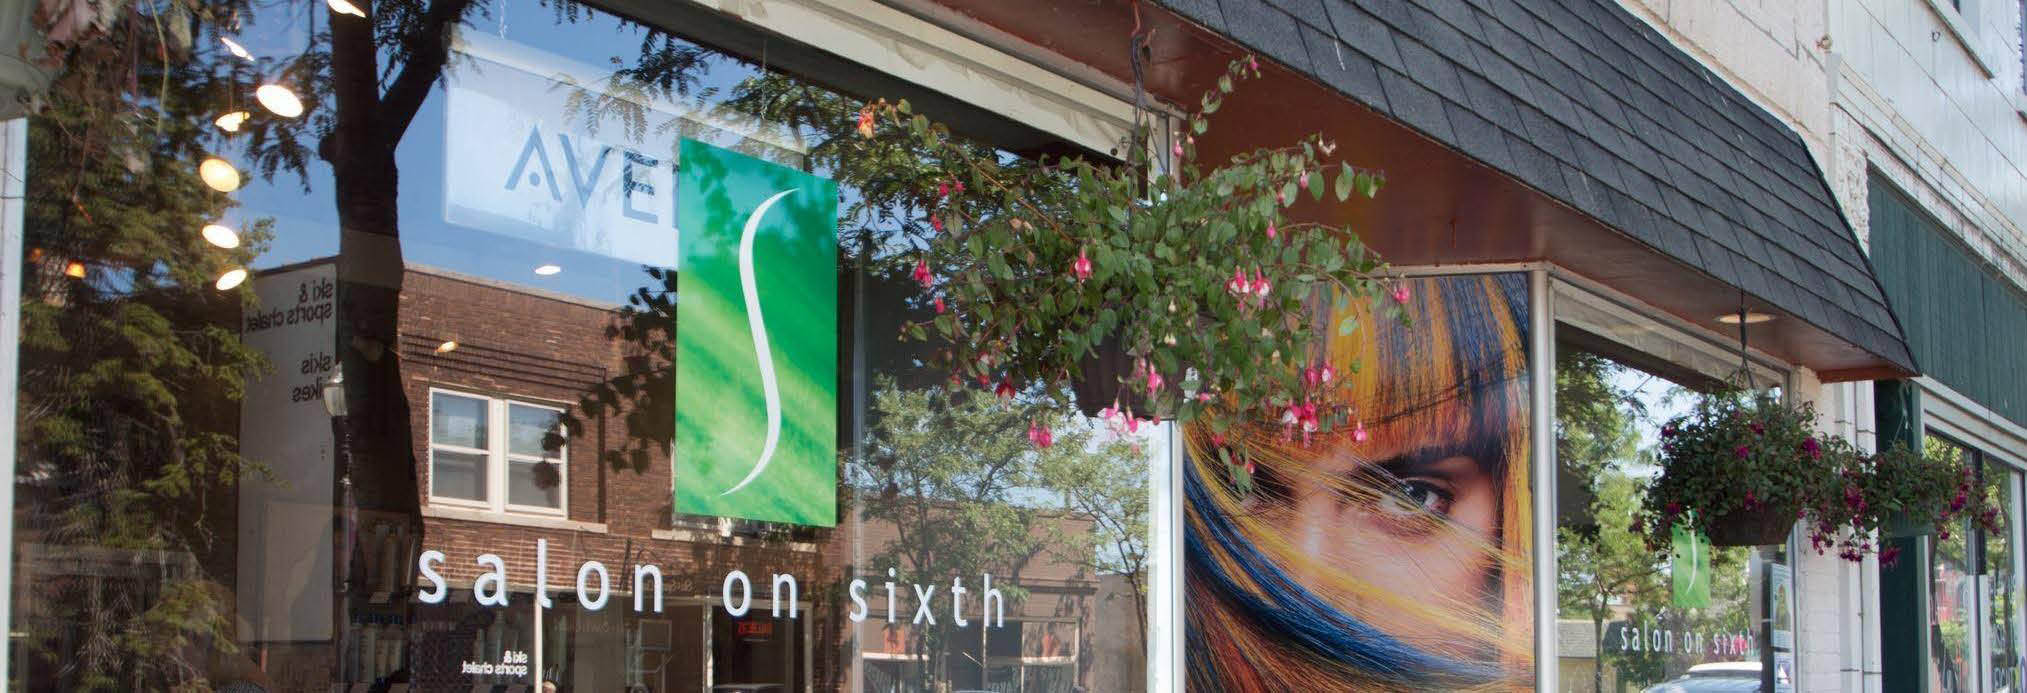 SALON ON SIXTH banner in Kenosha Wisconsin